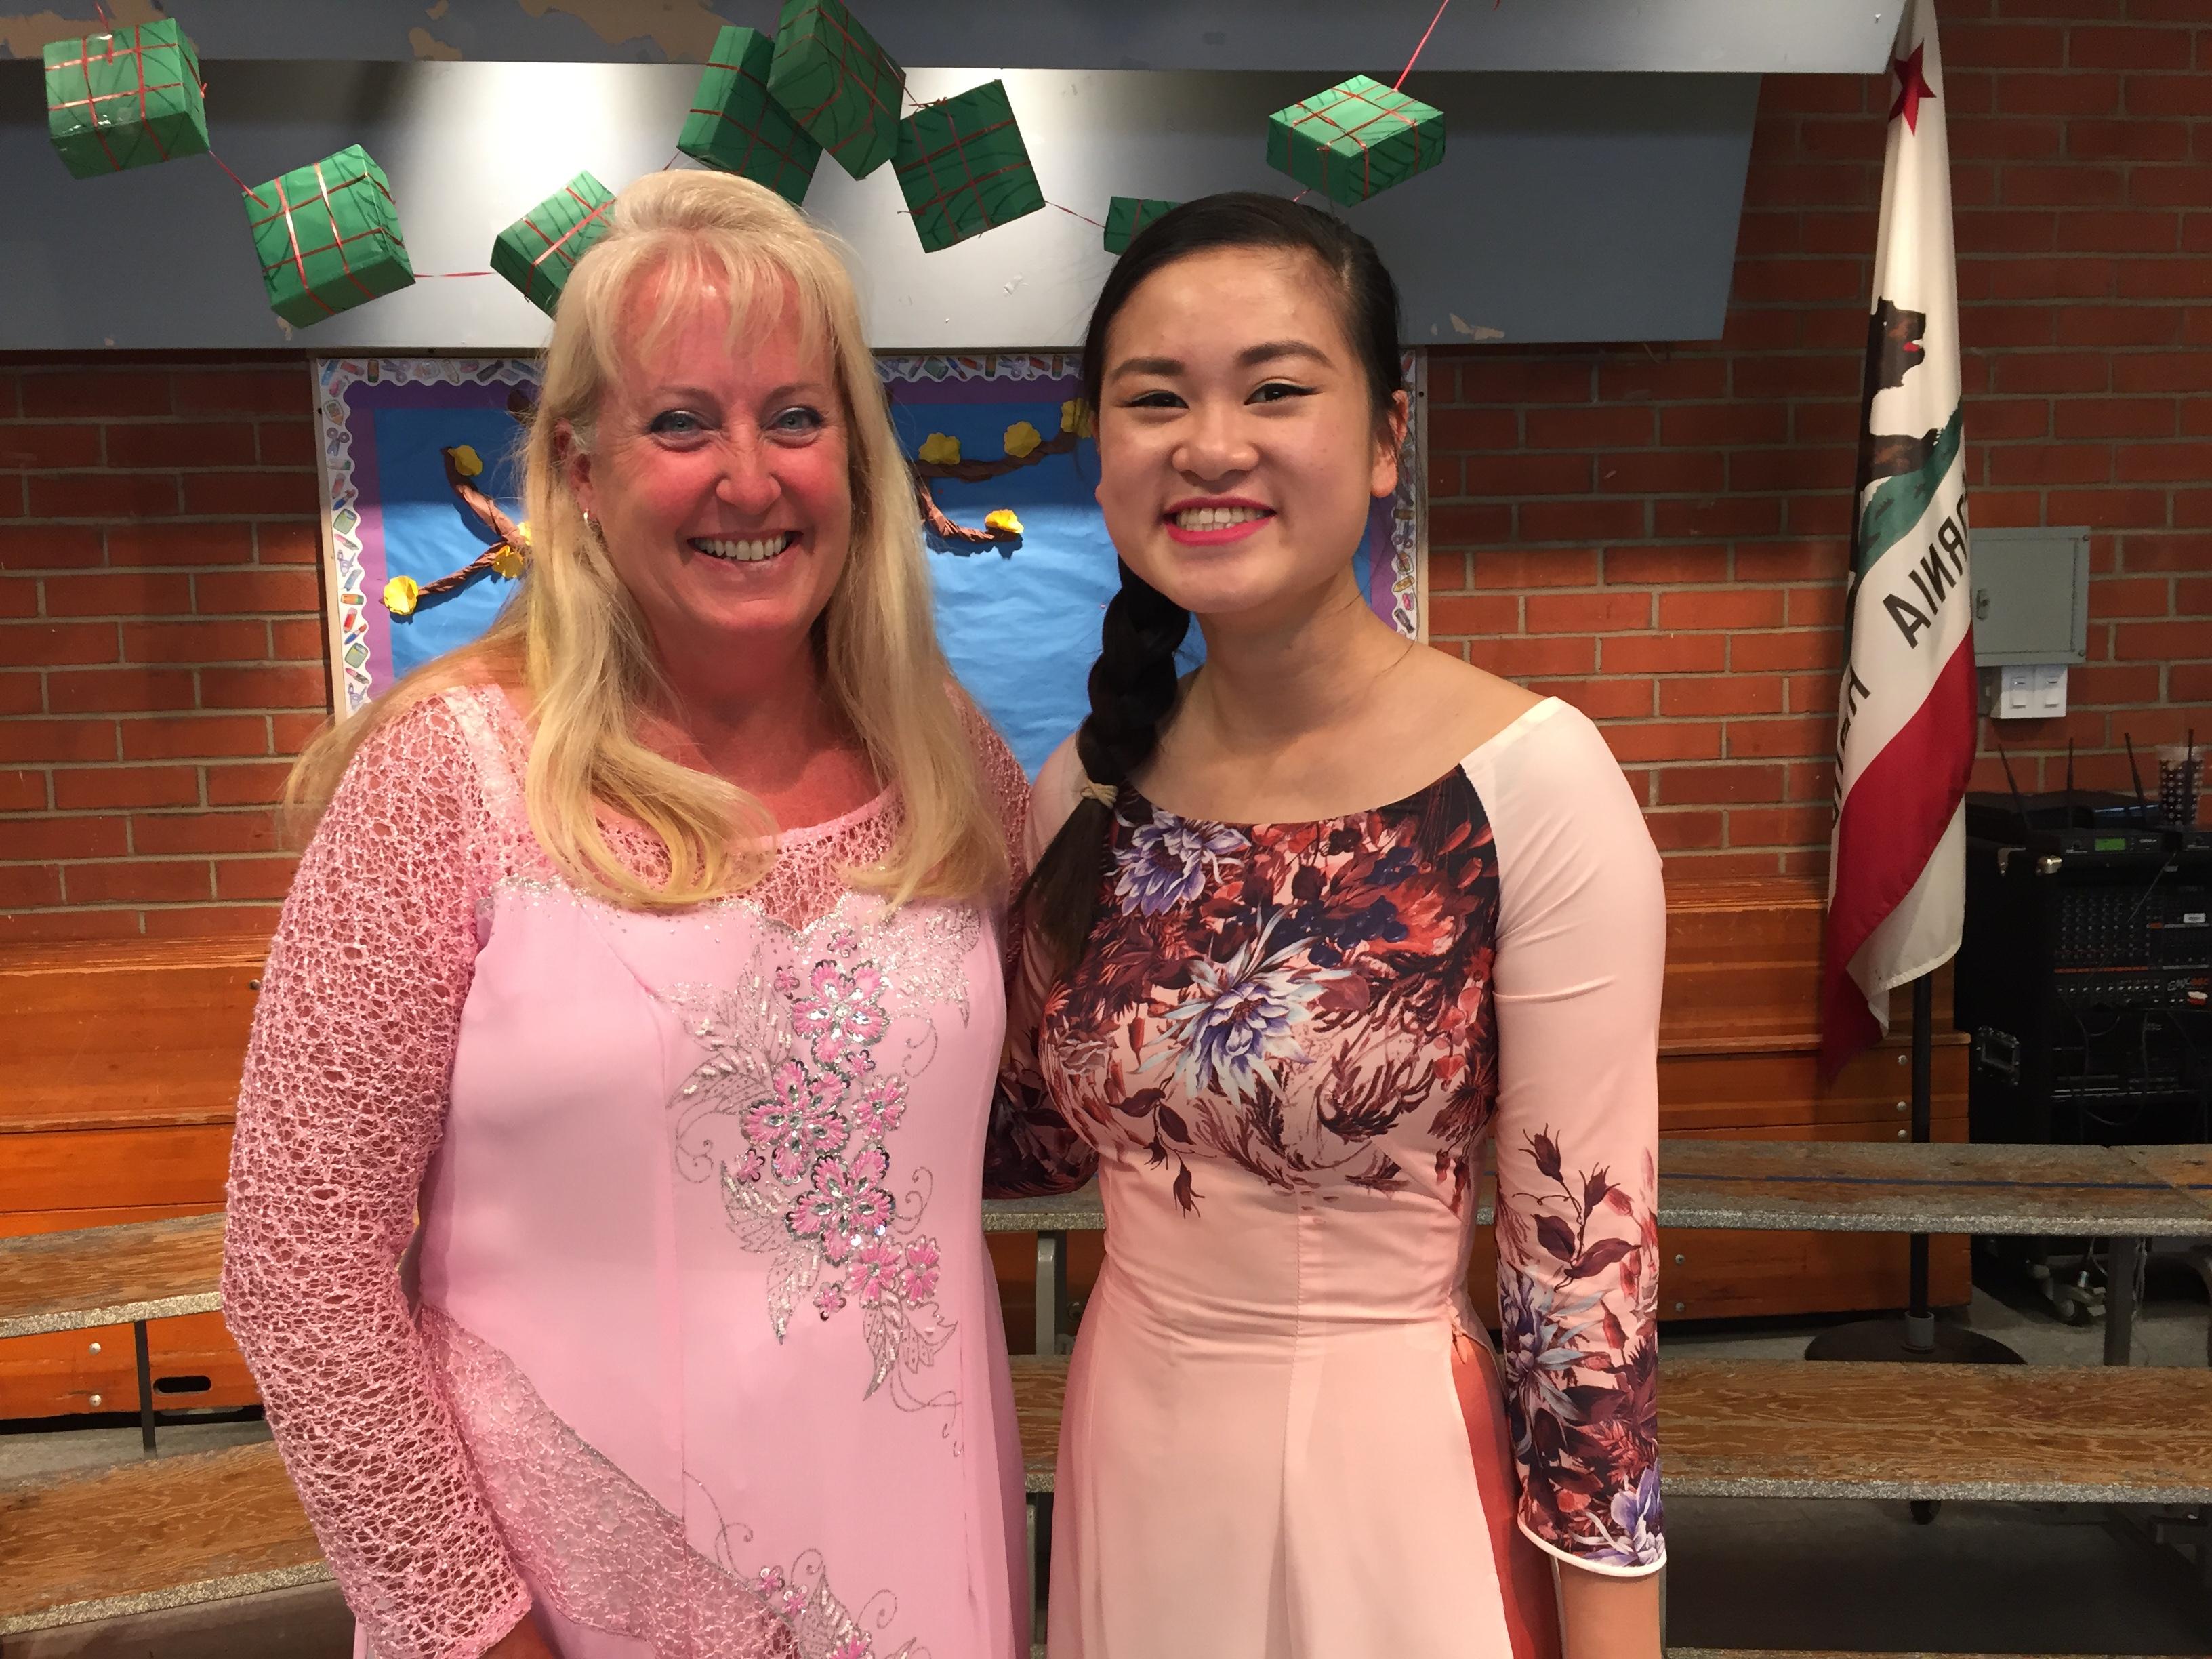 PATTY PELTON & JOSEPHINE NGUYEN - 2016 - Josephine former kindergarten teacher